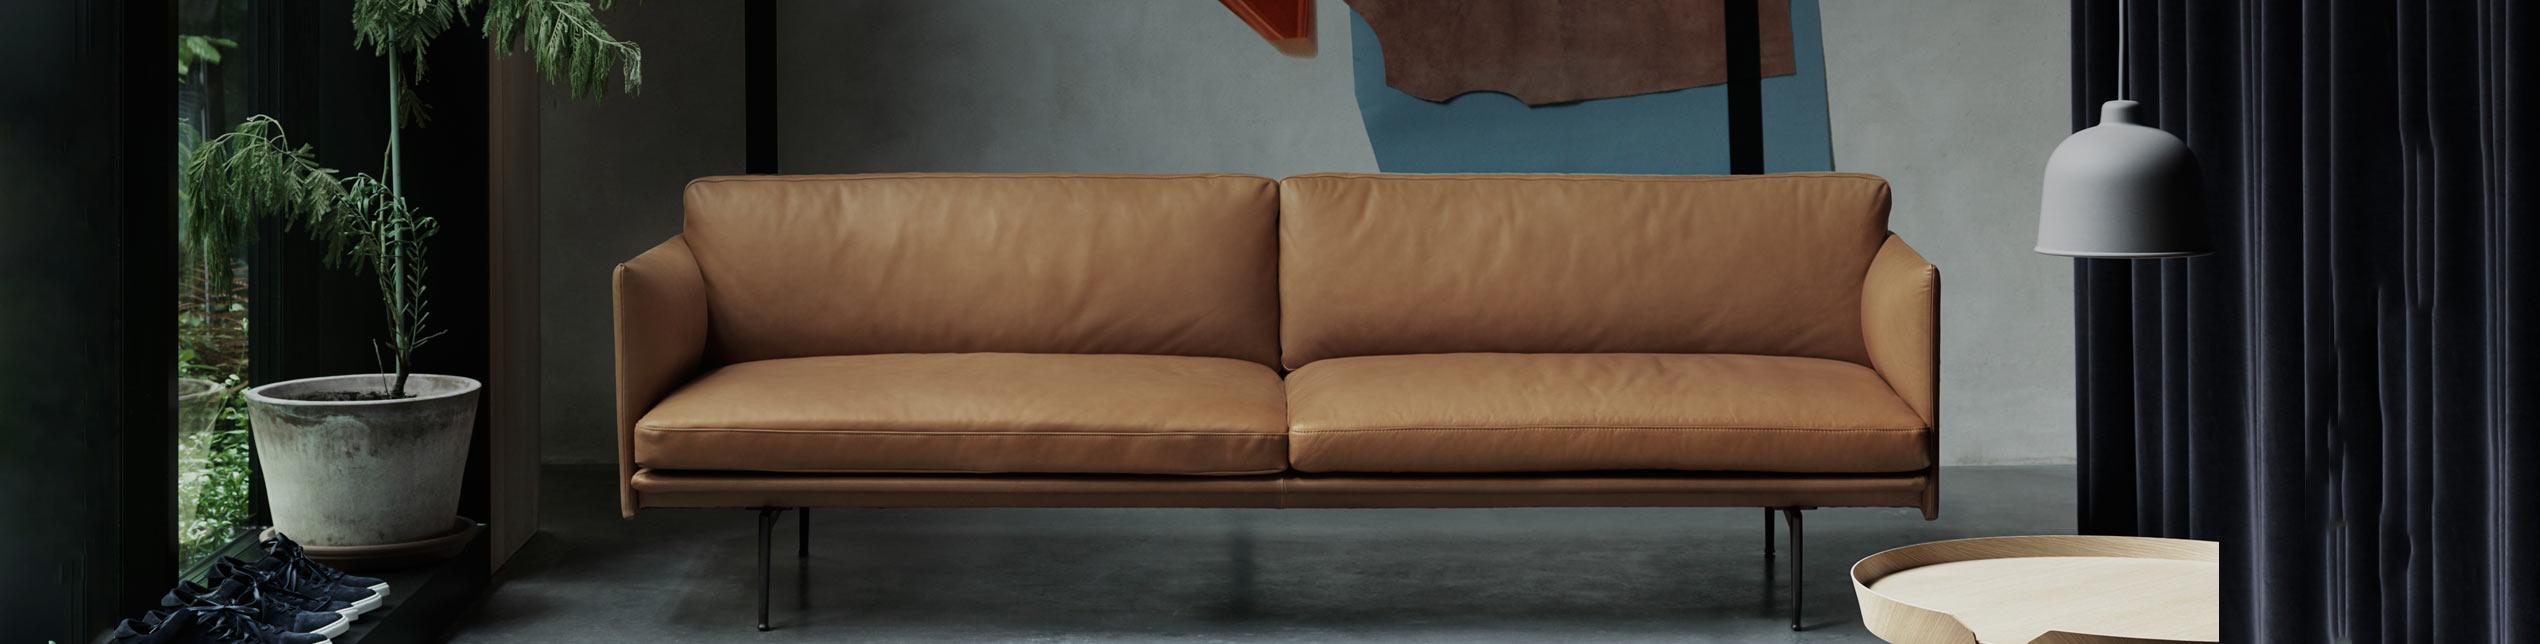 Sofas & lounge chairs